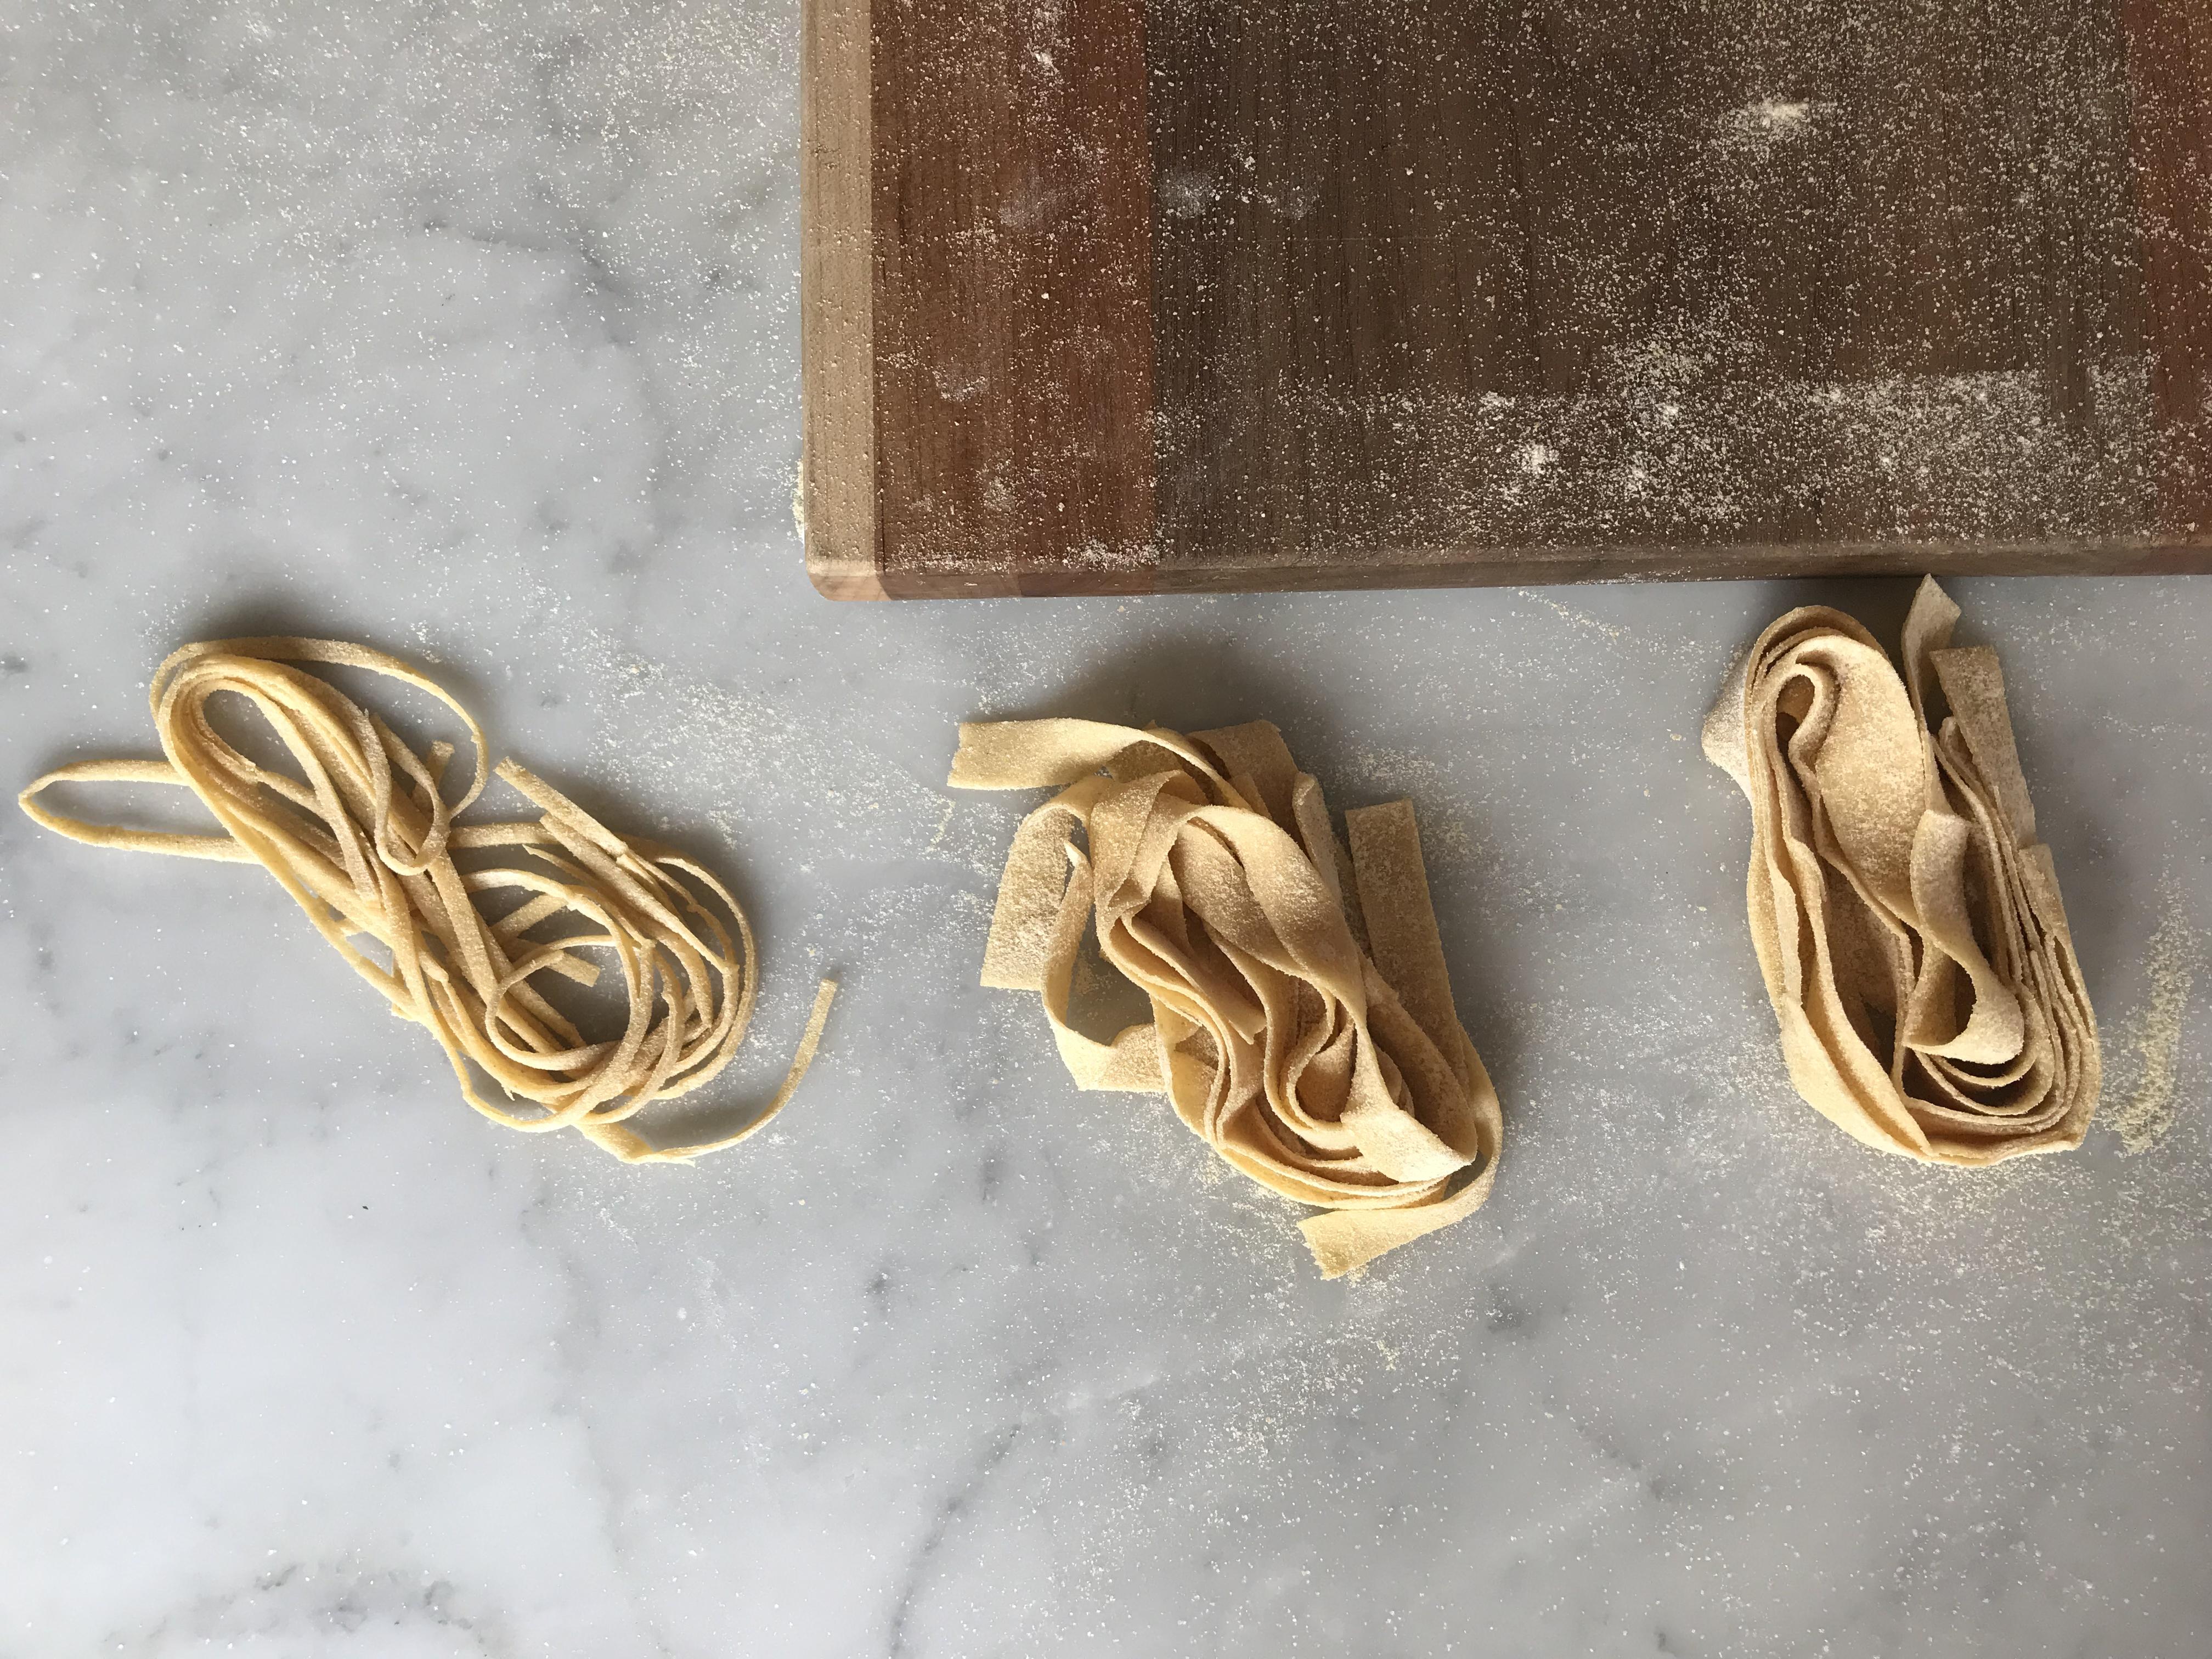 Pasta dough on counter_SRV